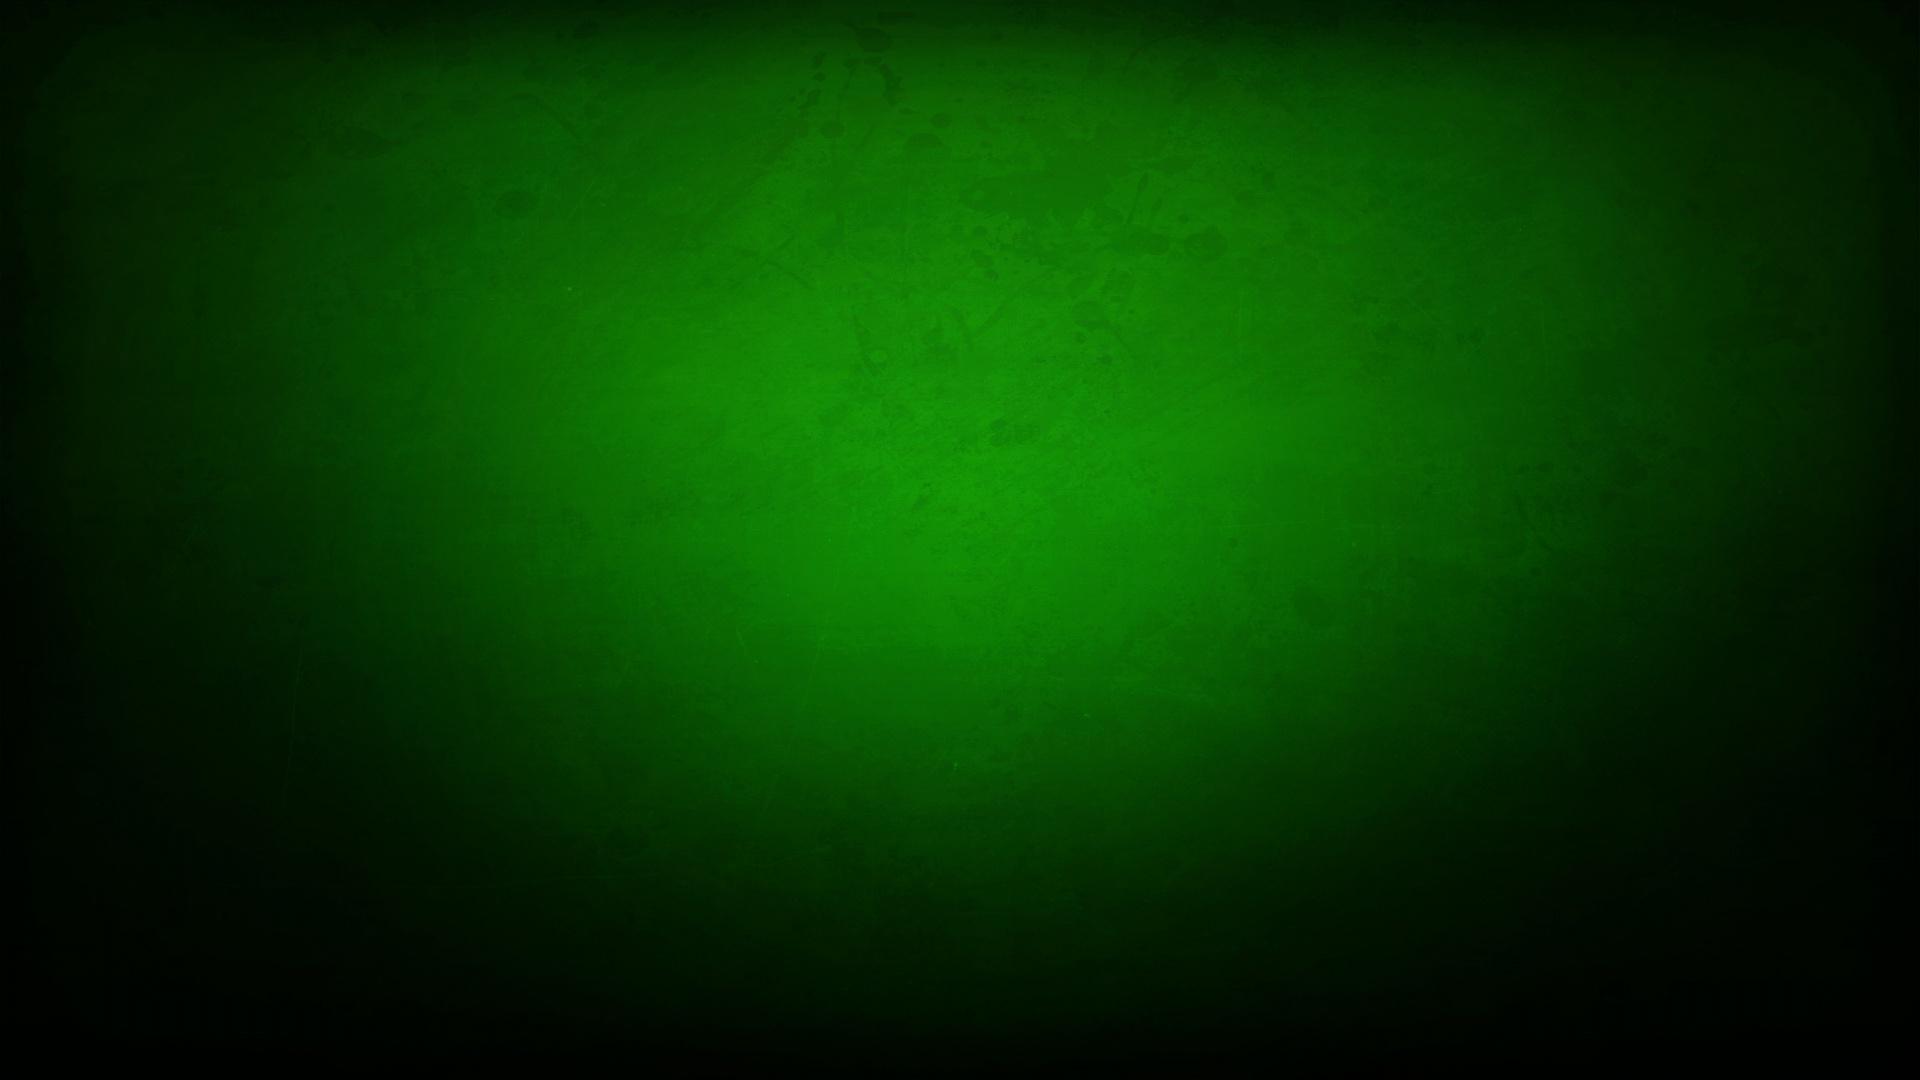 Green And Black Wallpapers 16 Desktop Wallpaper